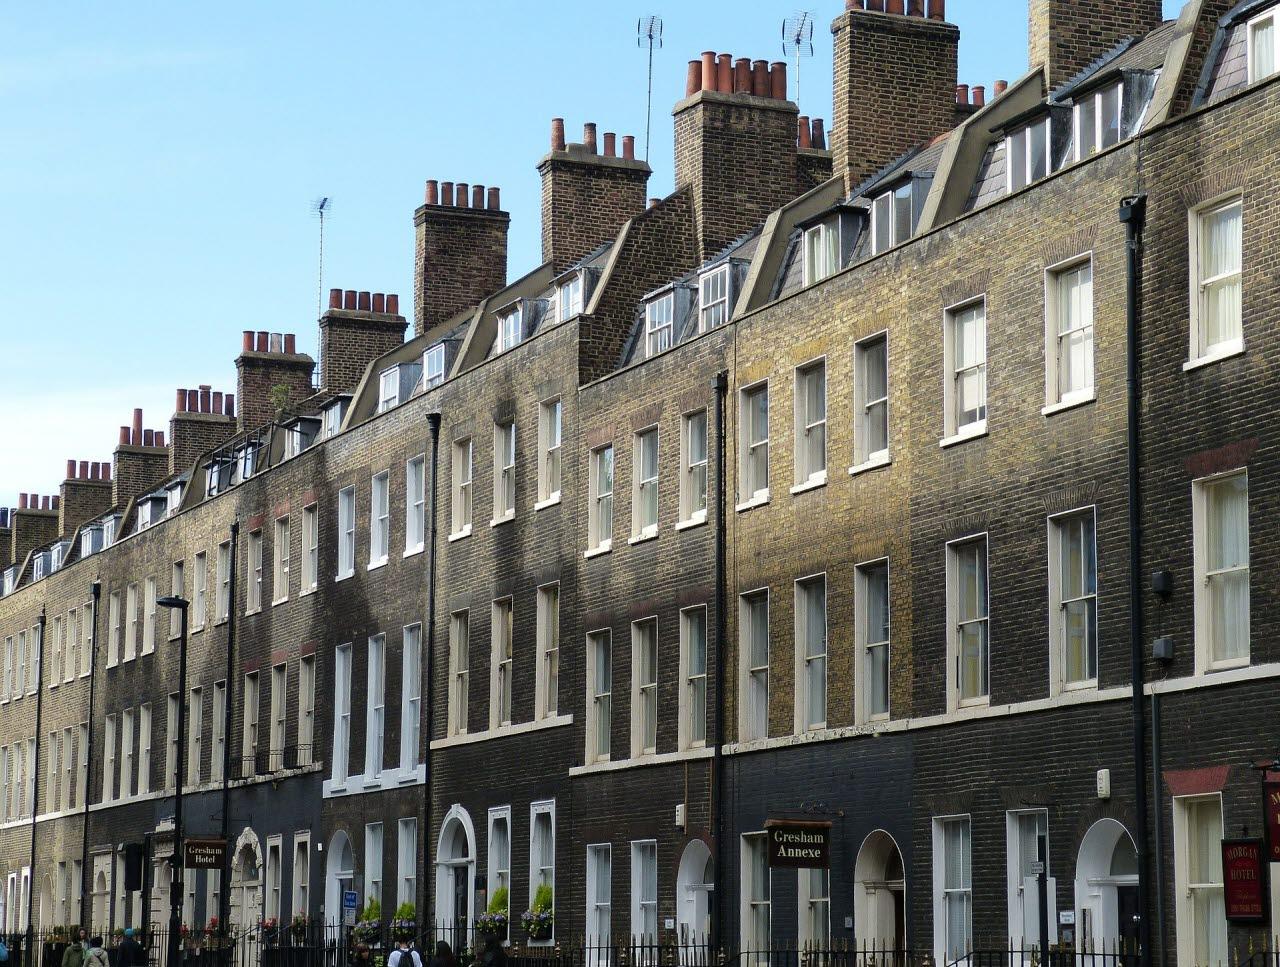 Row of houses in London, UK